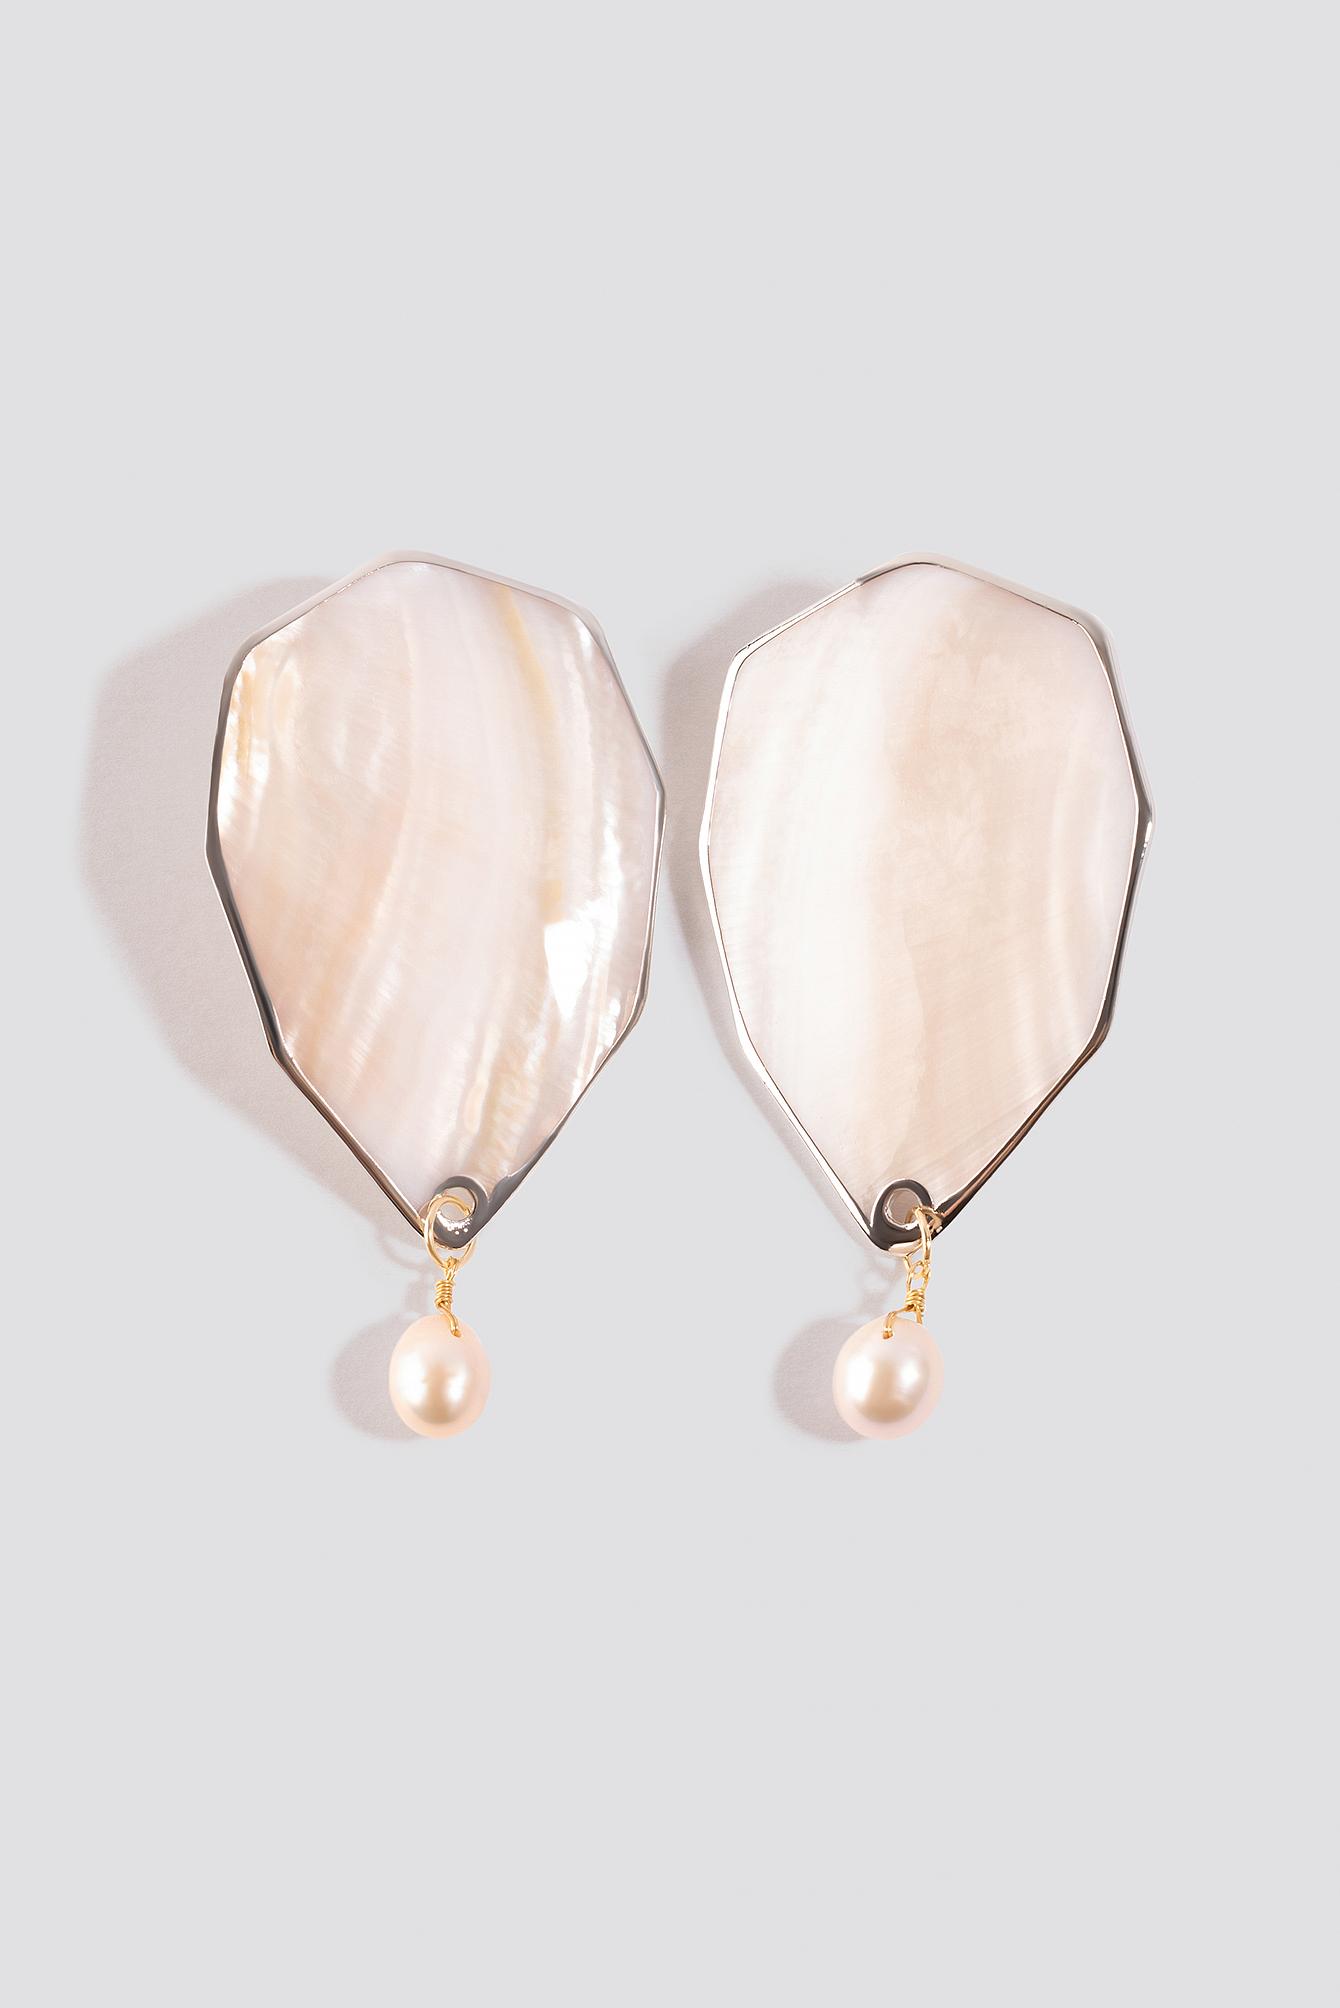 na-kd accessories -  Shell Pearl Earrings - White